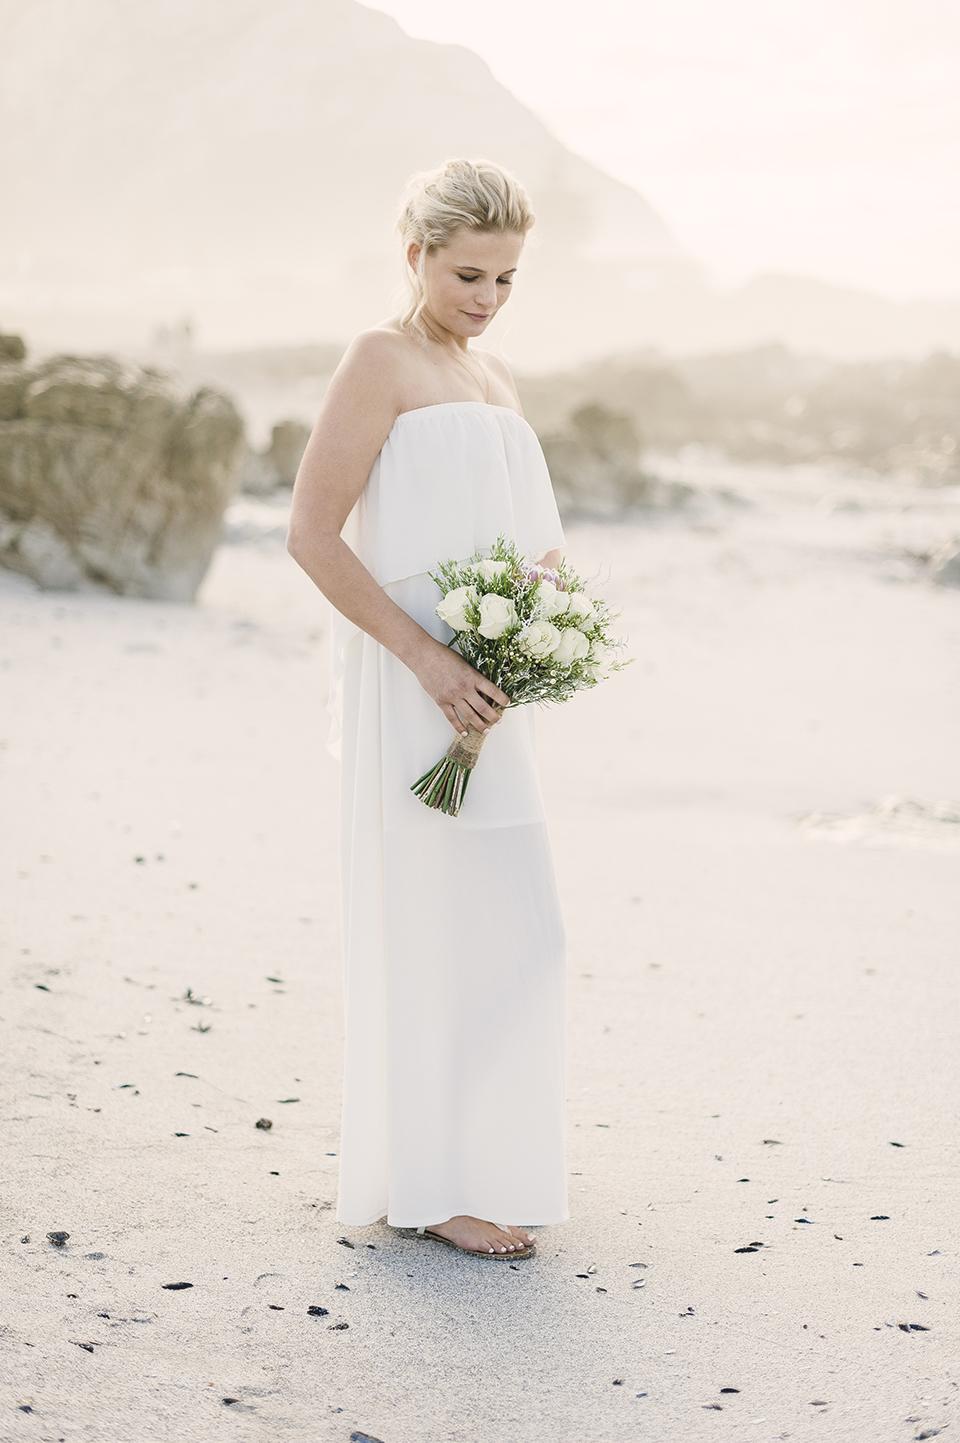 RyanParker_CapeTown_Photographer_Wedding_Hermanus_A&B_DSC_9390.jpg